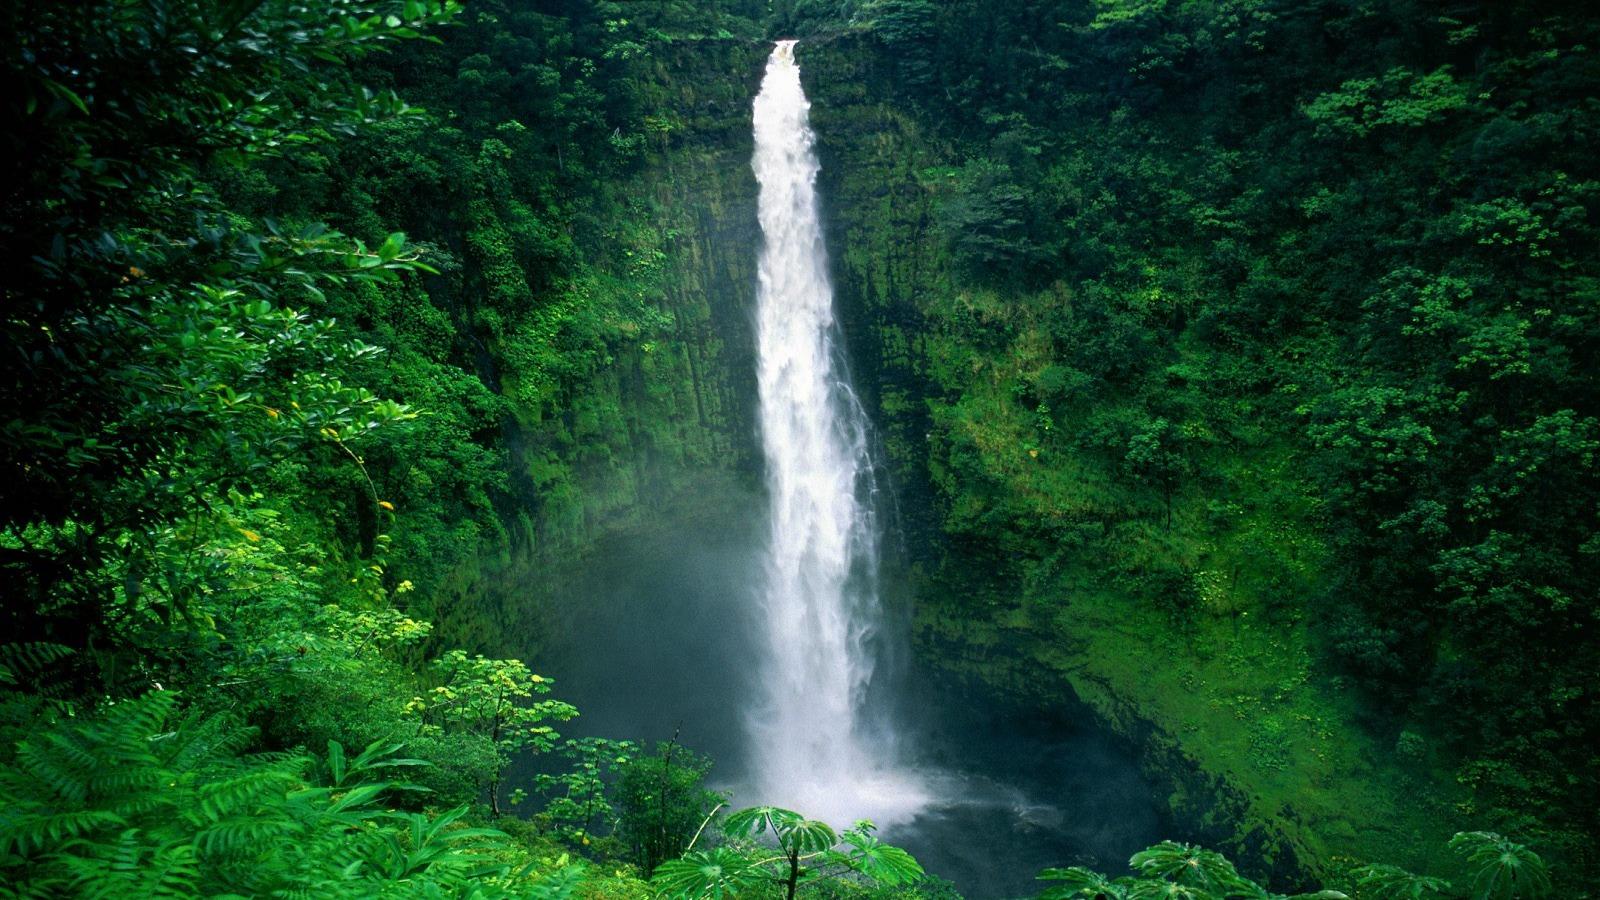 Falls Wallpaper Download アカカ滝壁紙滝自然 自然 壁紙 無料でダウンロード